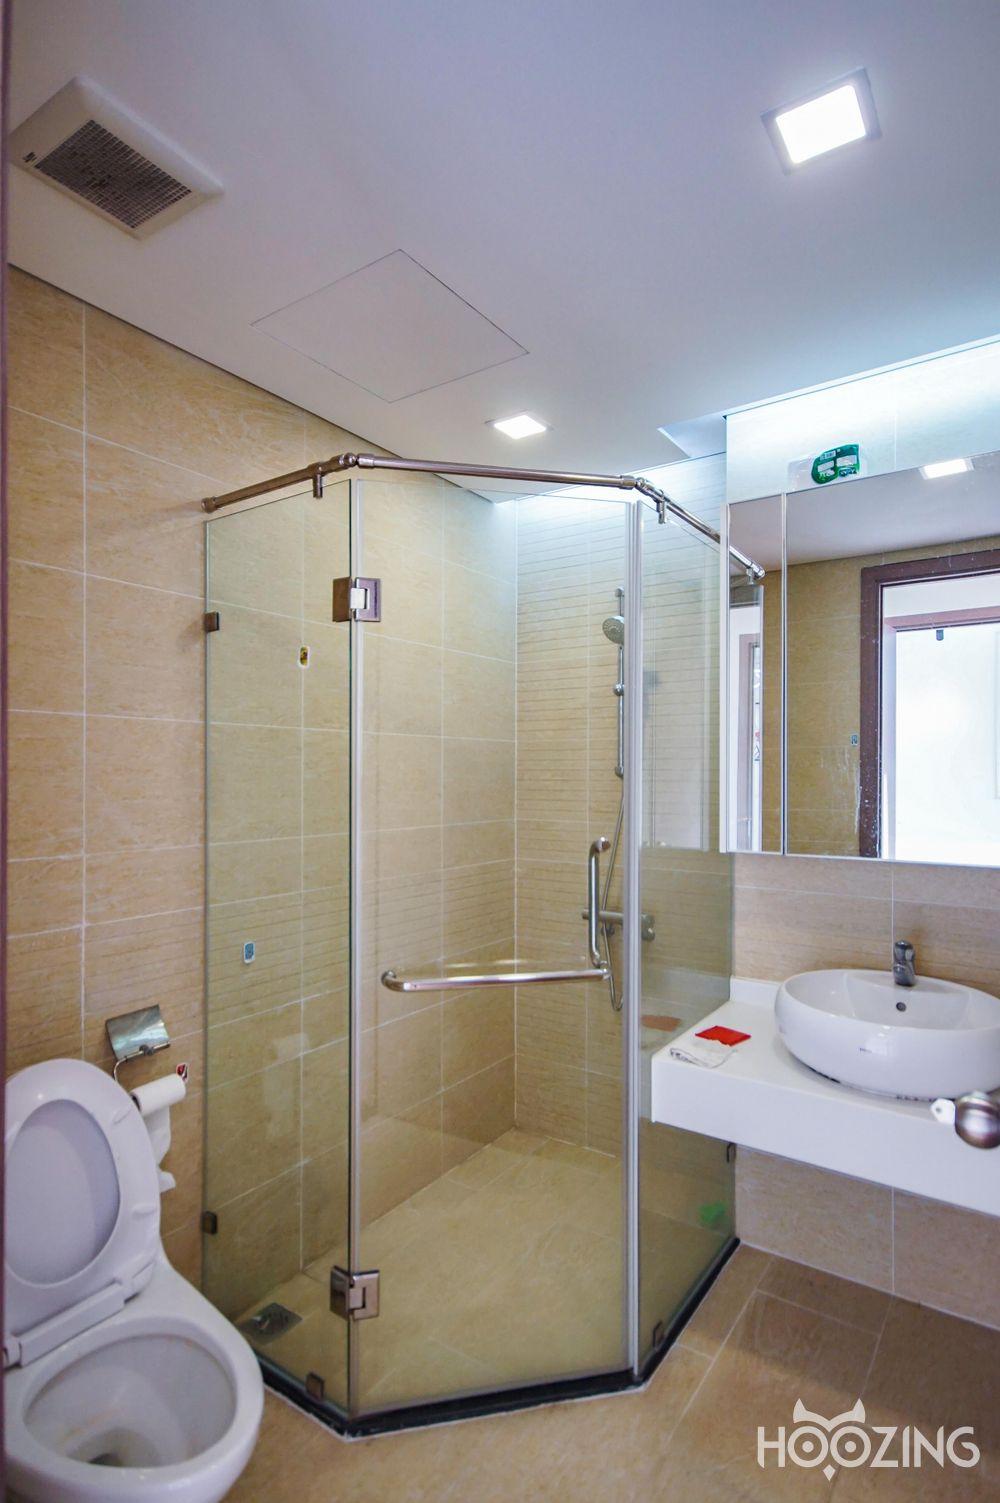 Vinhomes Central Park Office-tel Apartment 2 Bedrooms - Basic Furnished & Sun-Filled